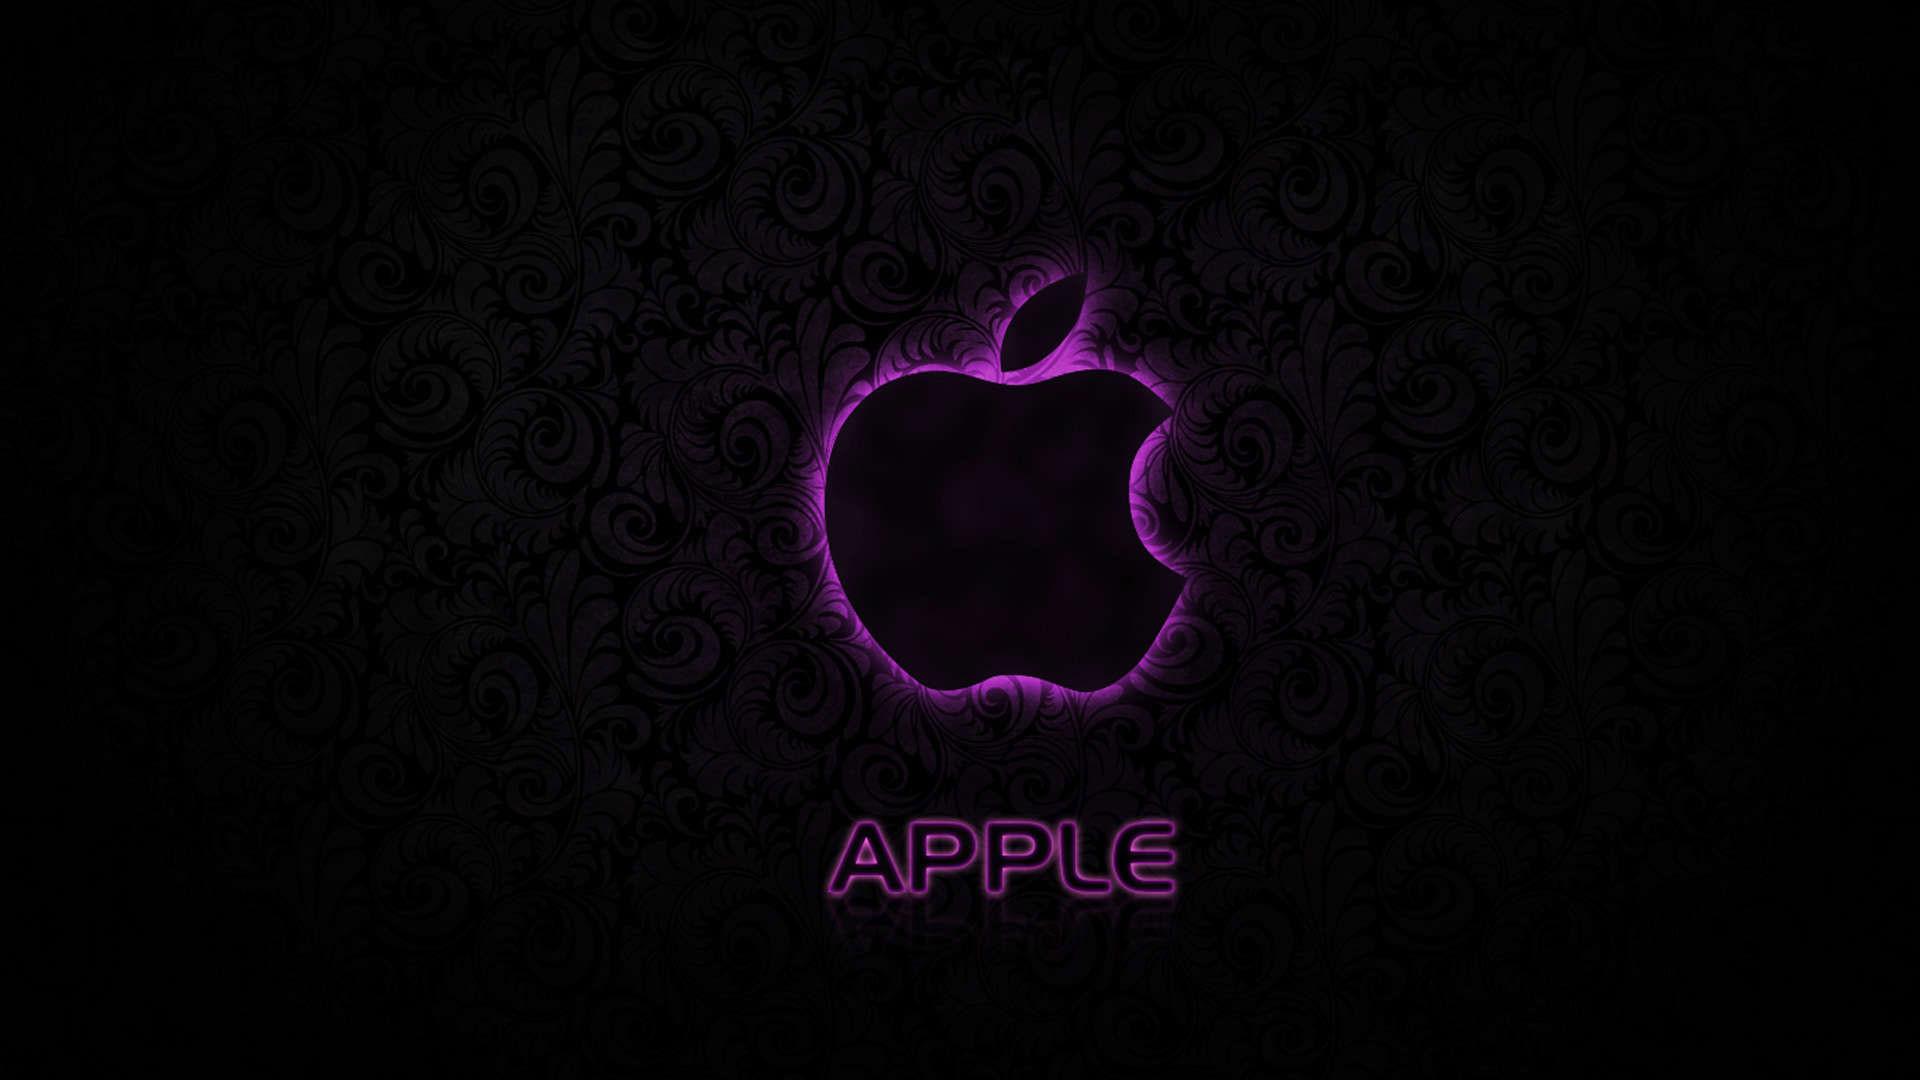 hd pics photos nice apple logo dark neon purple hd quality desktop  background wallpaper